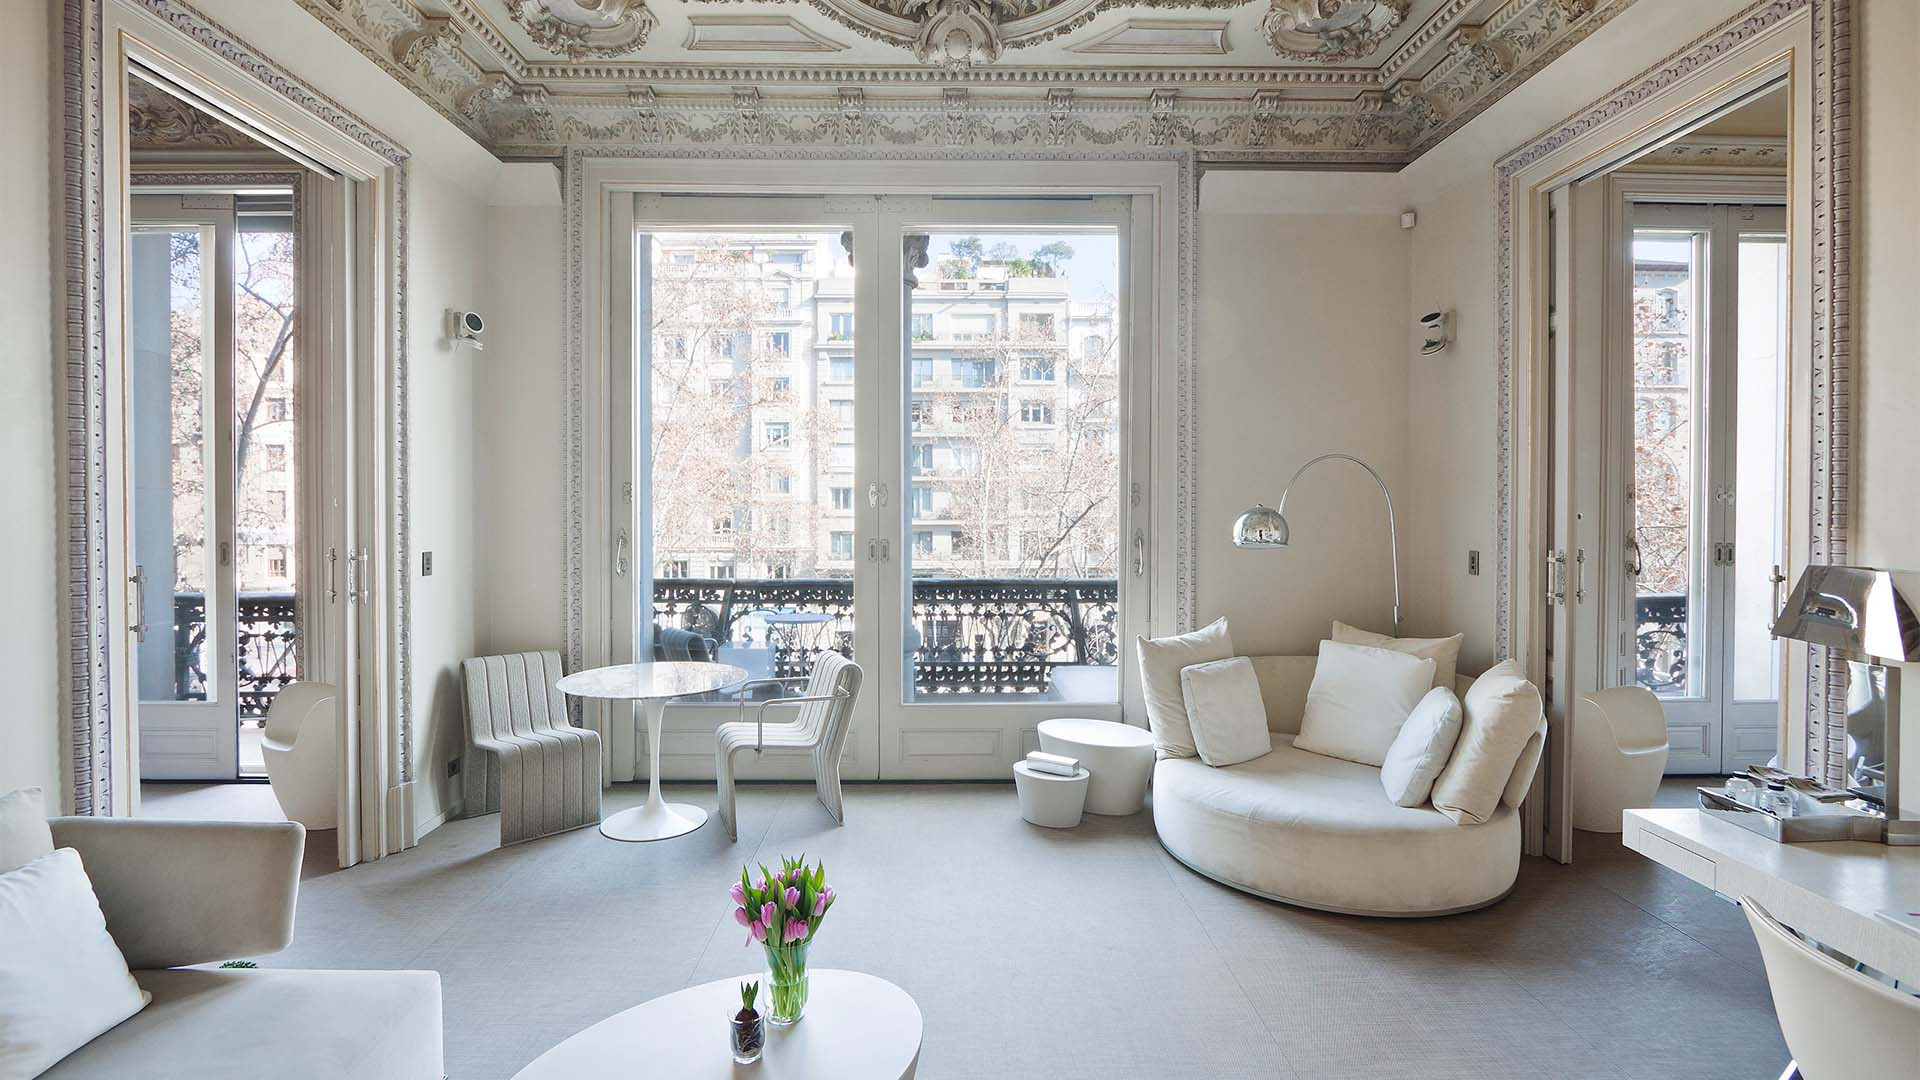 Rooms at El Palauet Living, Barcelona